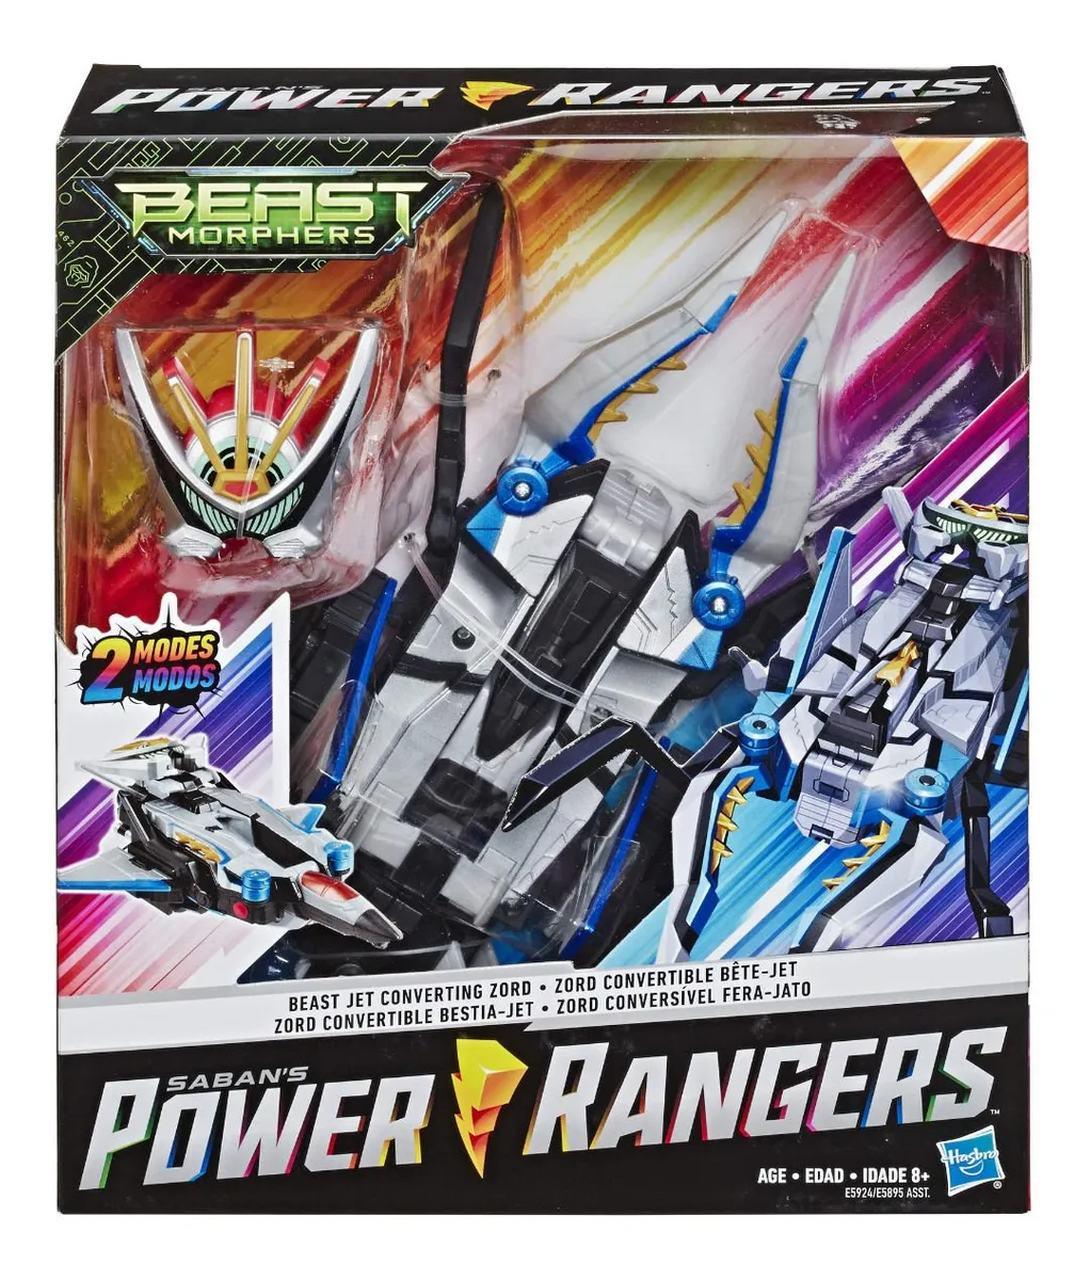 Boneco Power Rangers Zord Conversível Fera-Jato 2 Modos